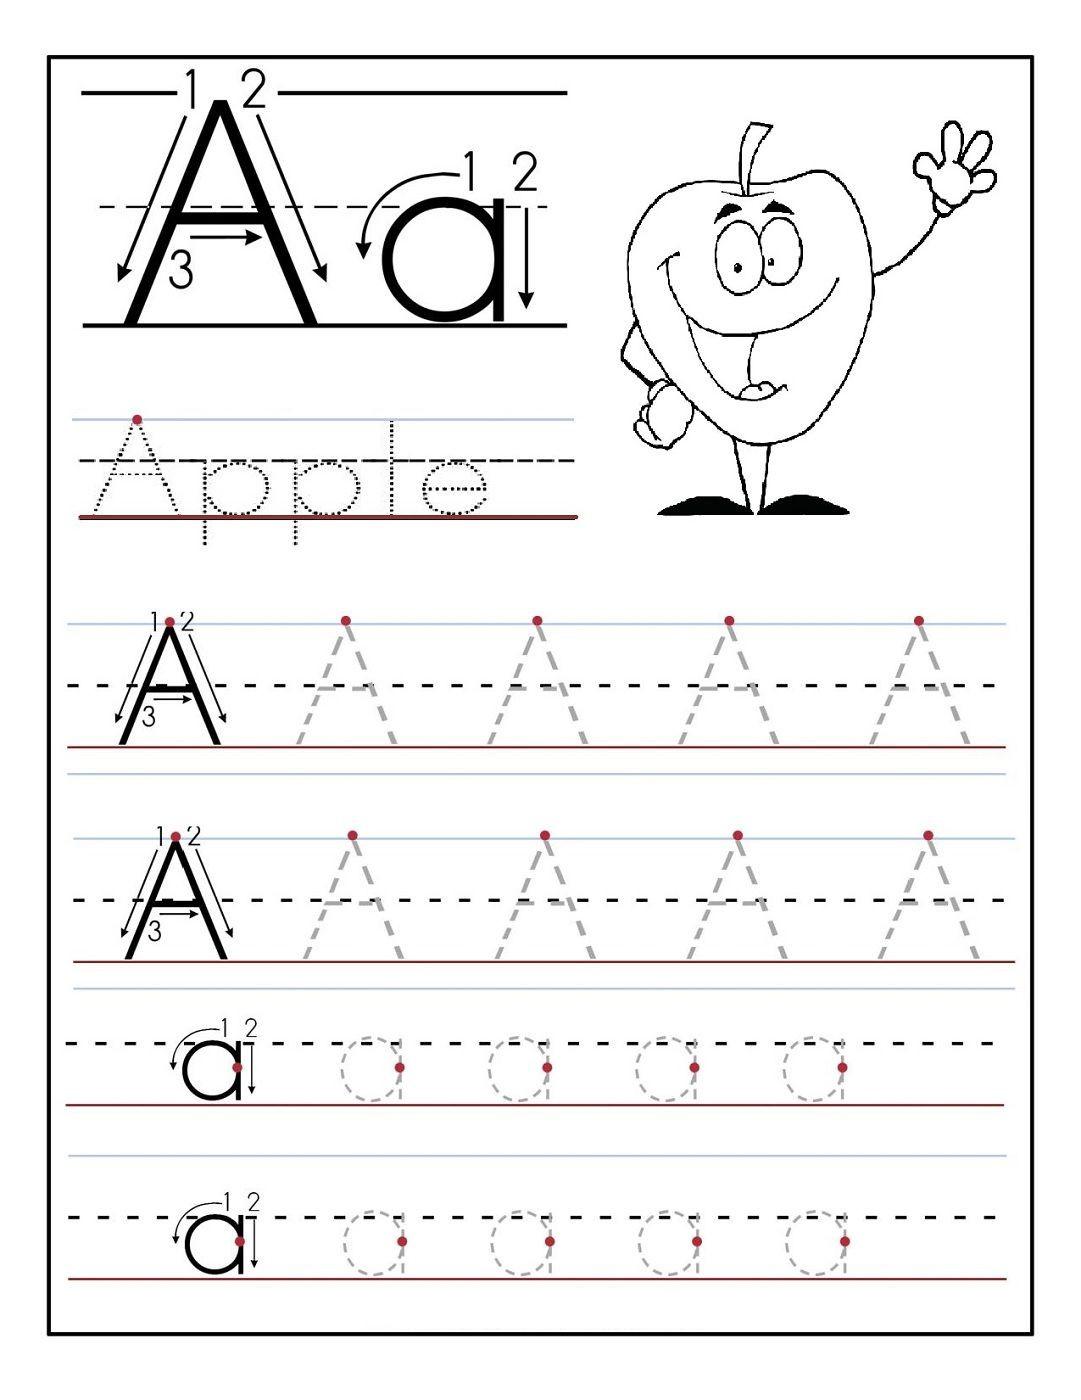 18 Inspirational Free Printable Preschool Worksheets Tracing Letters - Free Printable Preschool Worksheets Tracing Letters